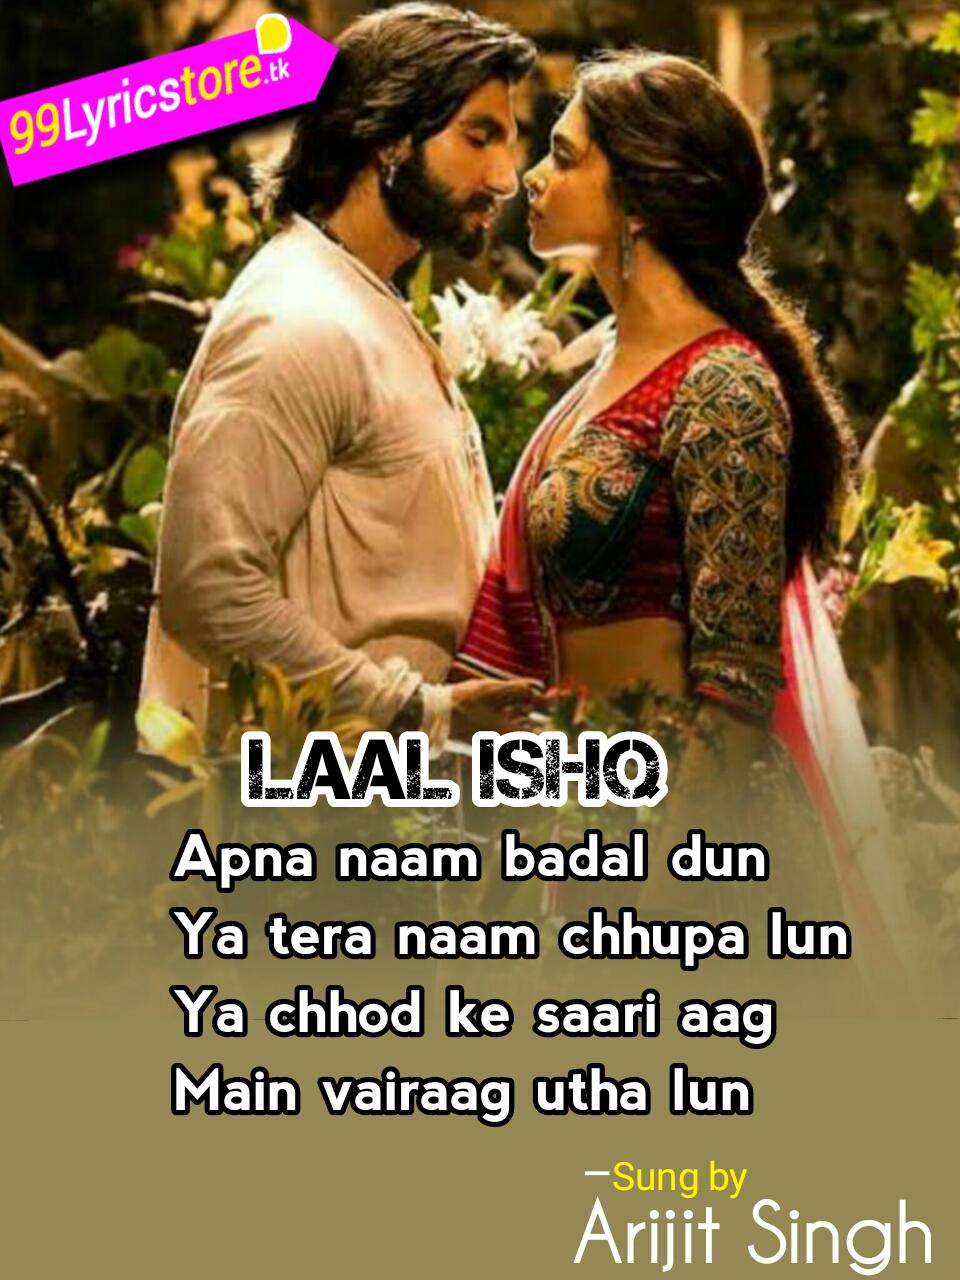 Ranveer Singh Song Lyrics, Deepika Pandunkon Song Lyrics, Arijit Singh Song Lyrics, Hindi Song Lyrics, Bollywood movies Song Lyrics